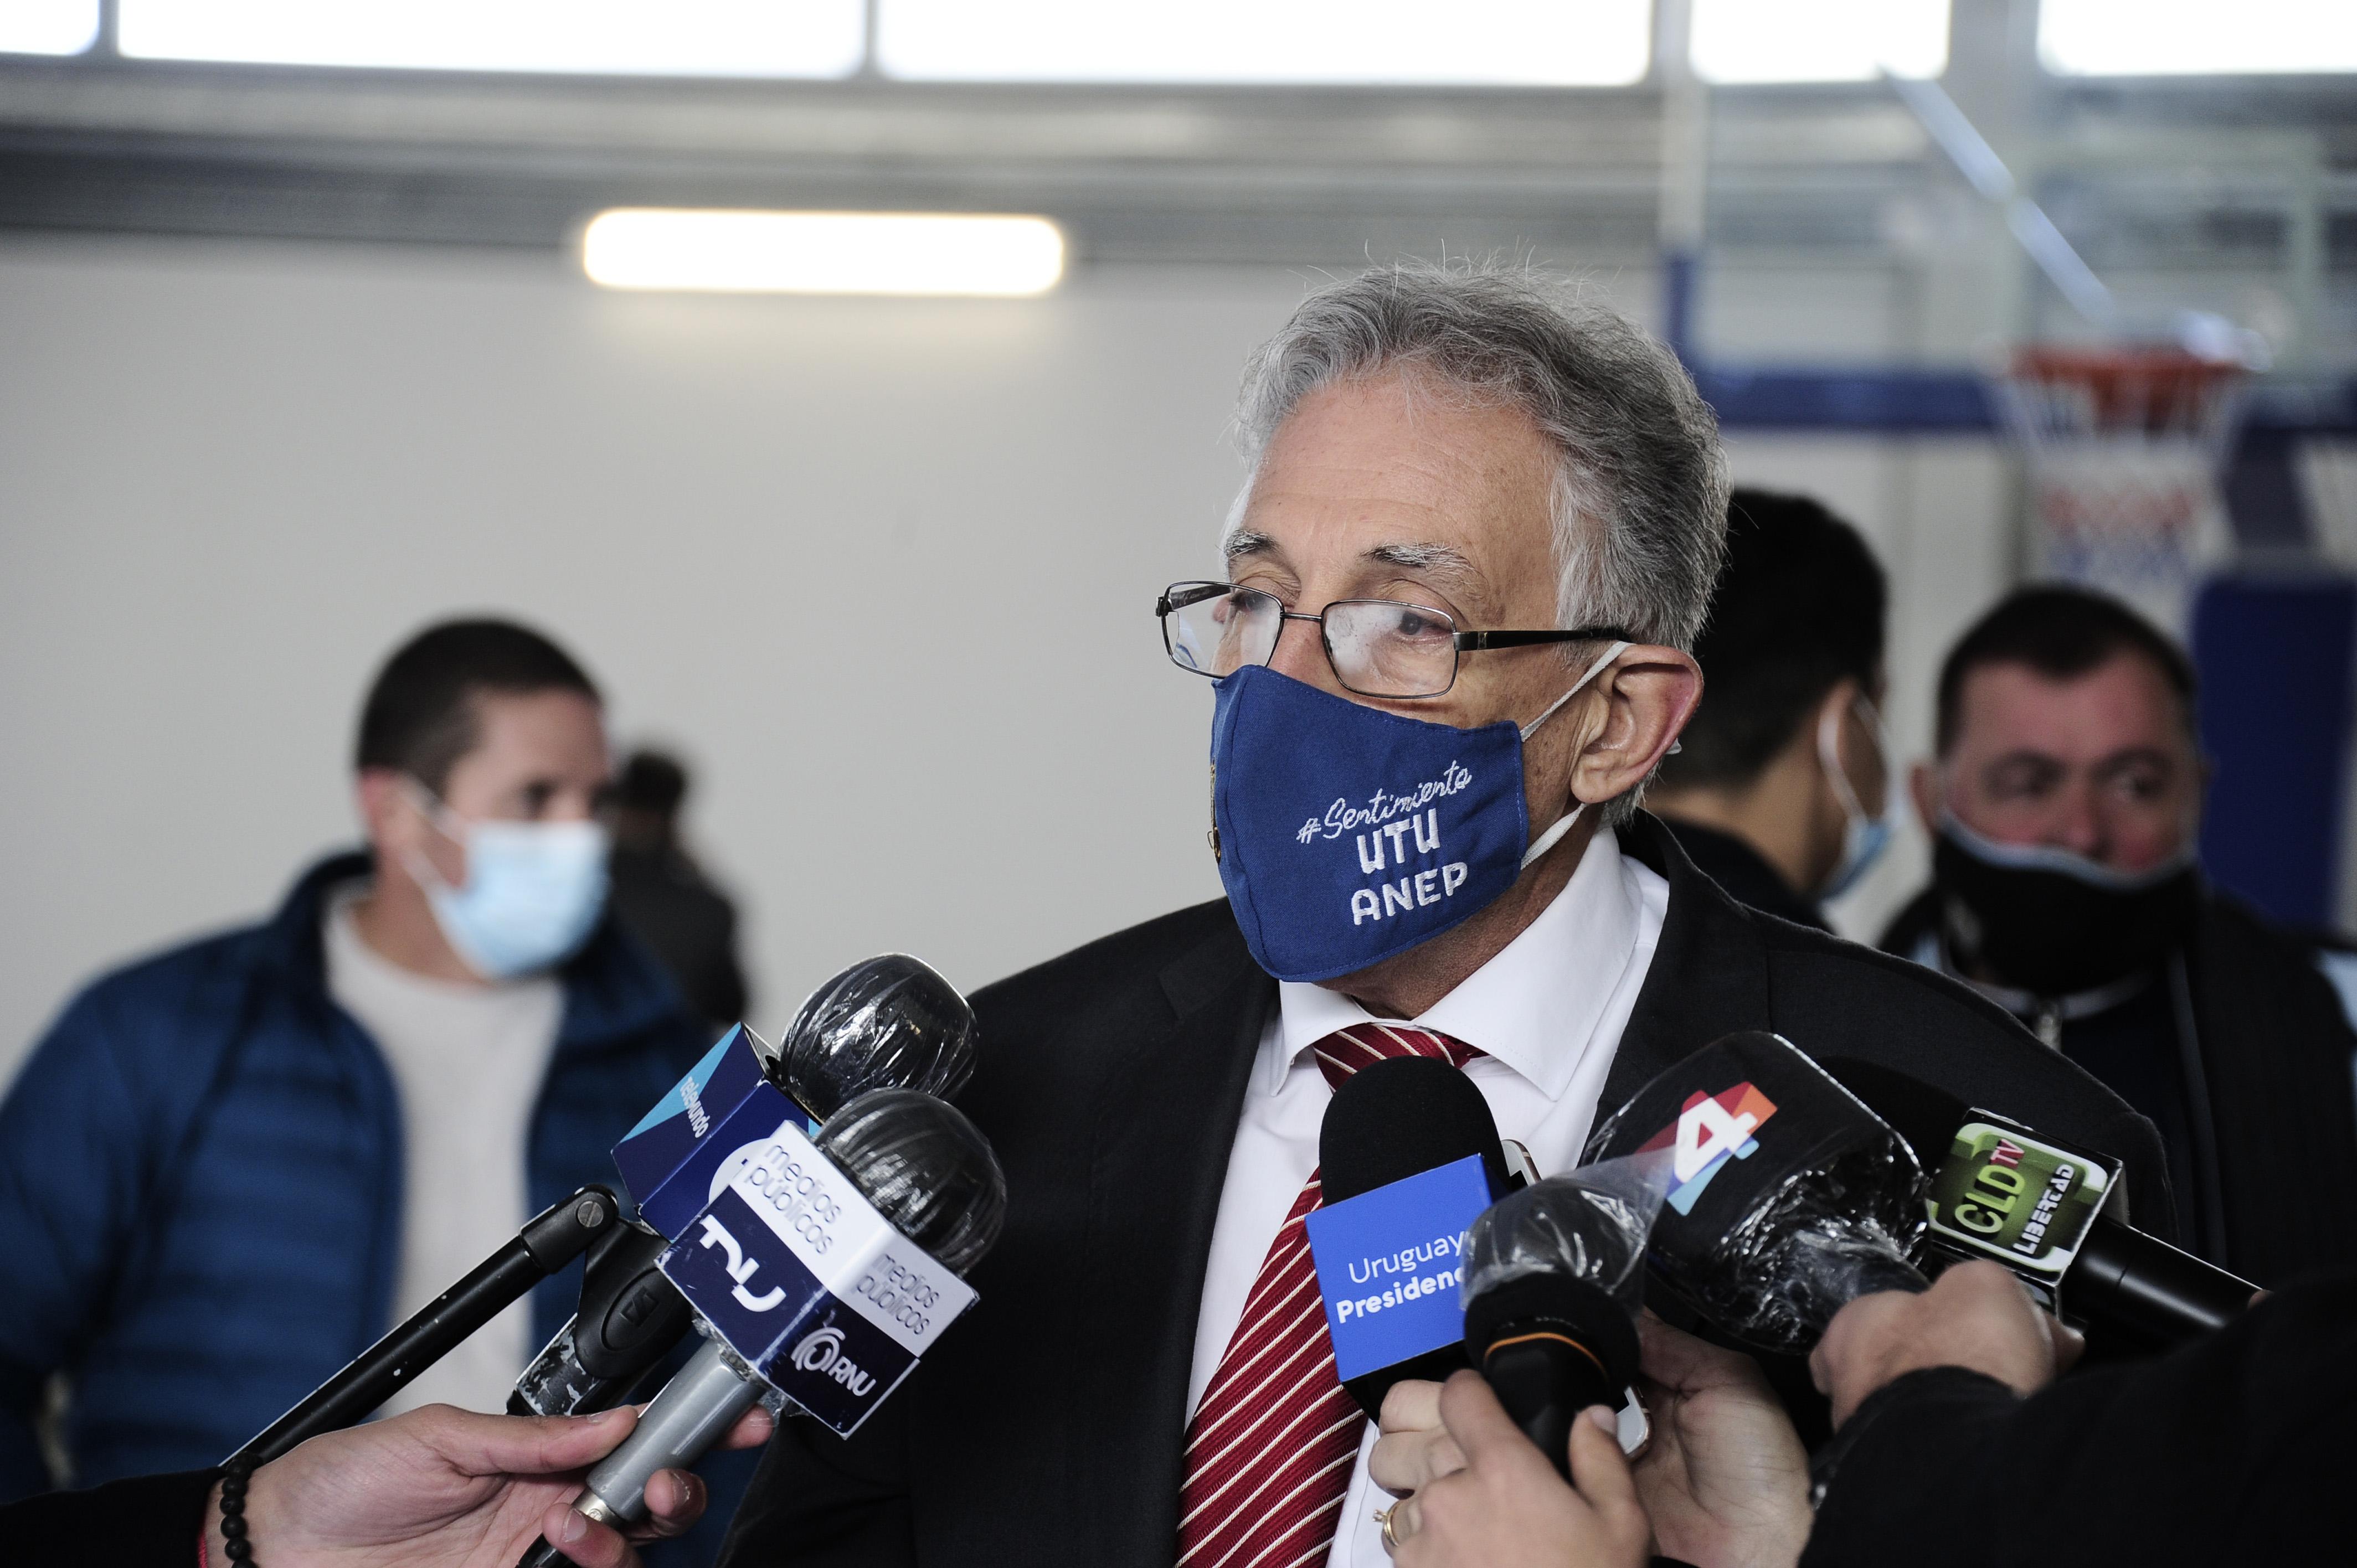 Director General de la UTU, Juan Pereyra